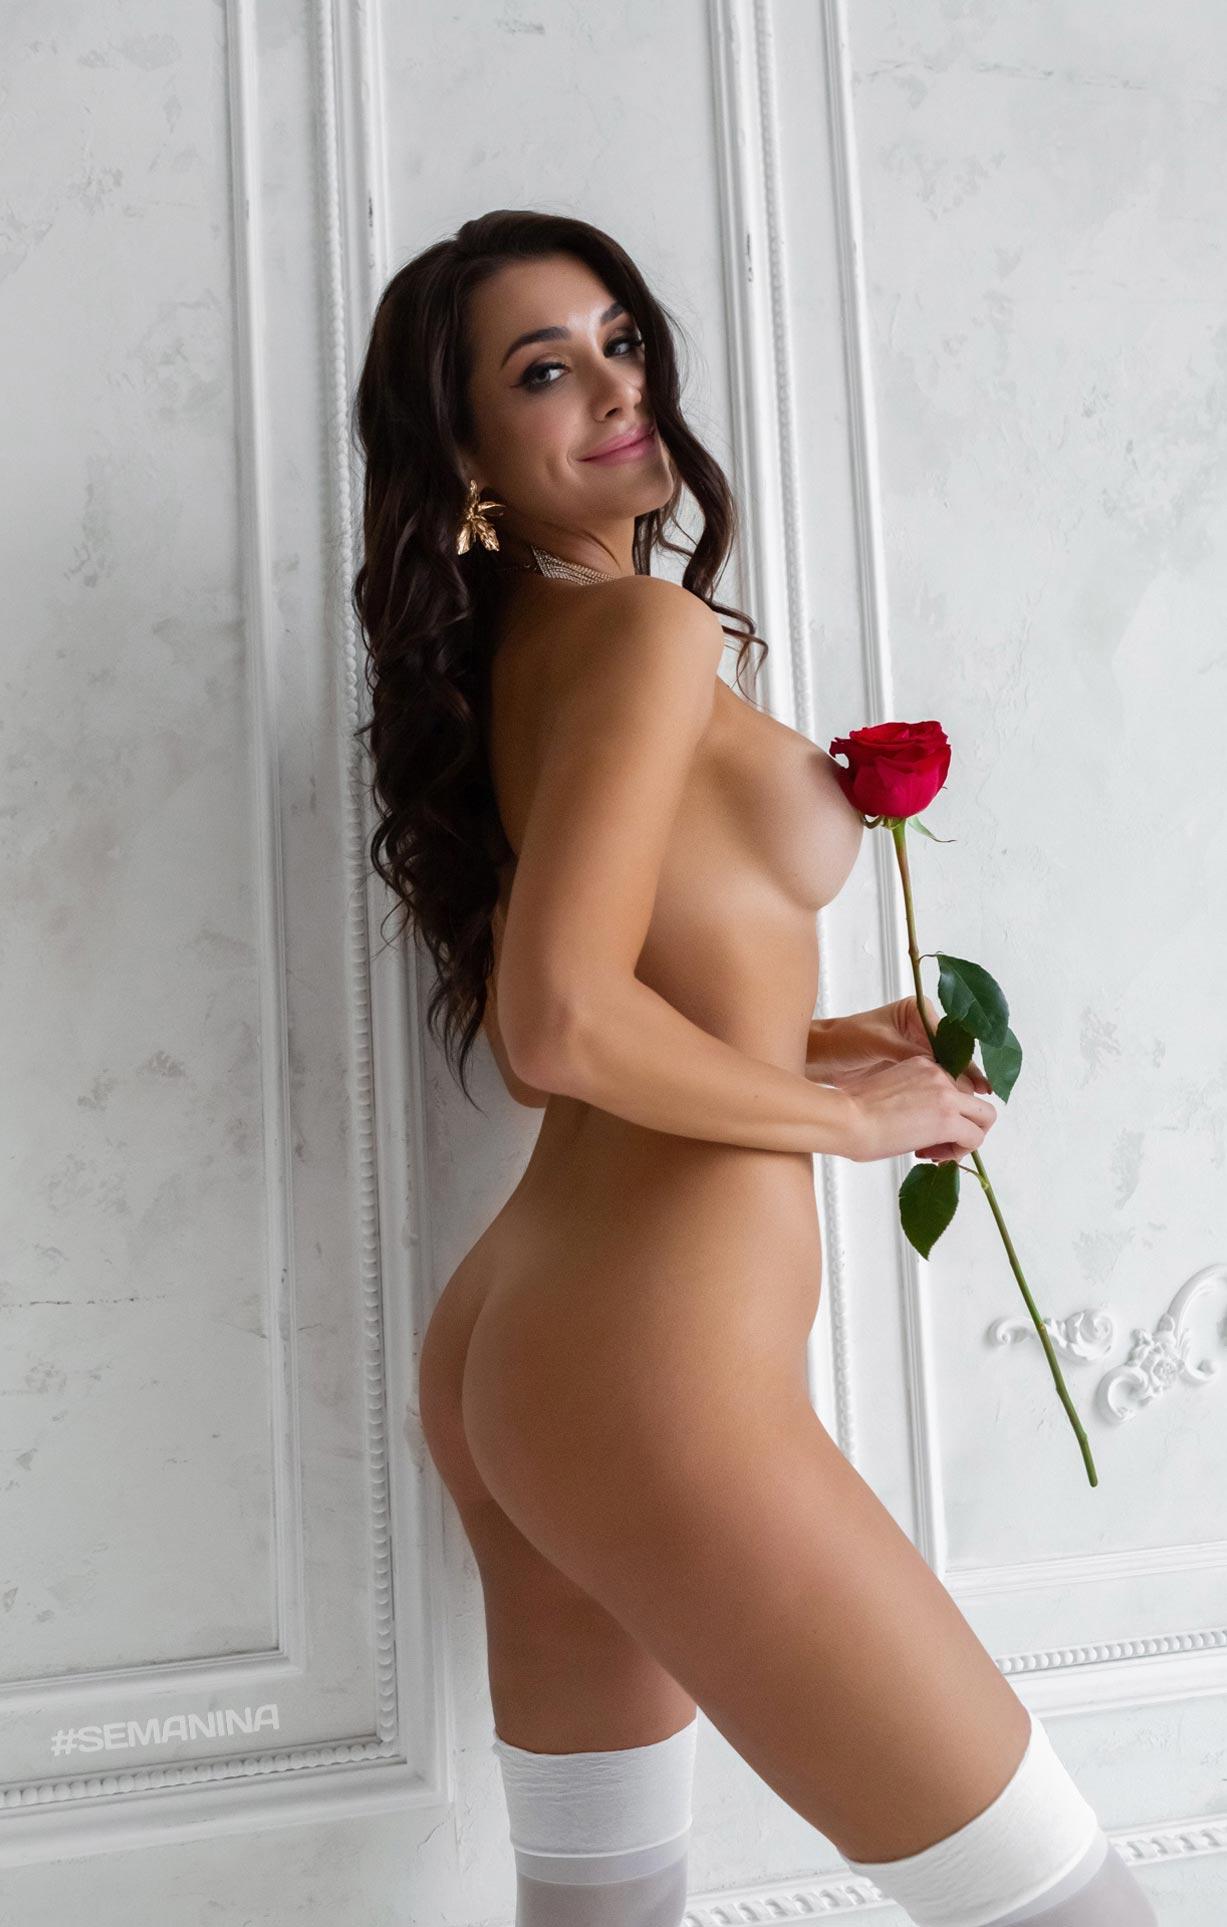 красная роза для Виктории / фото 12